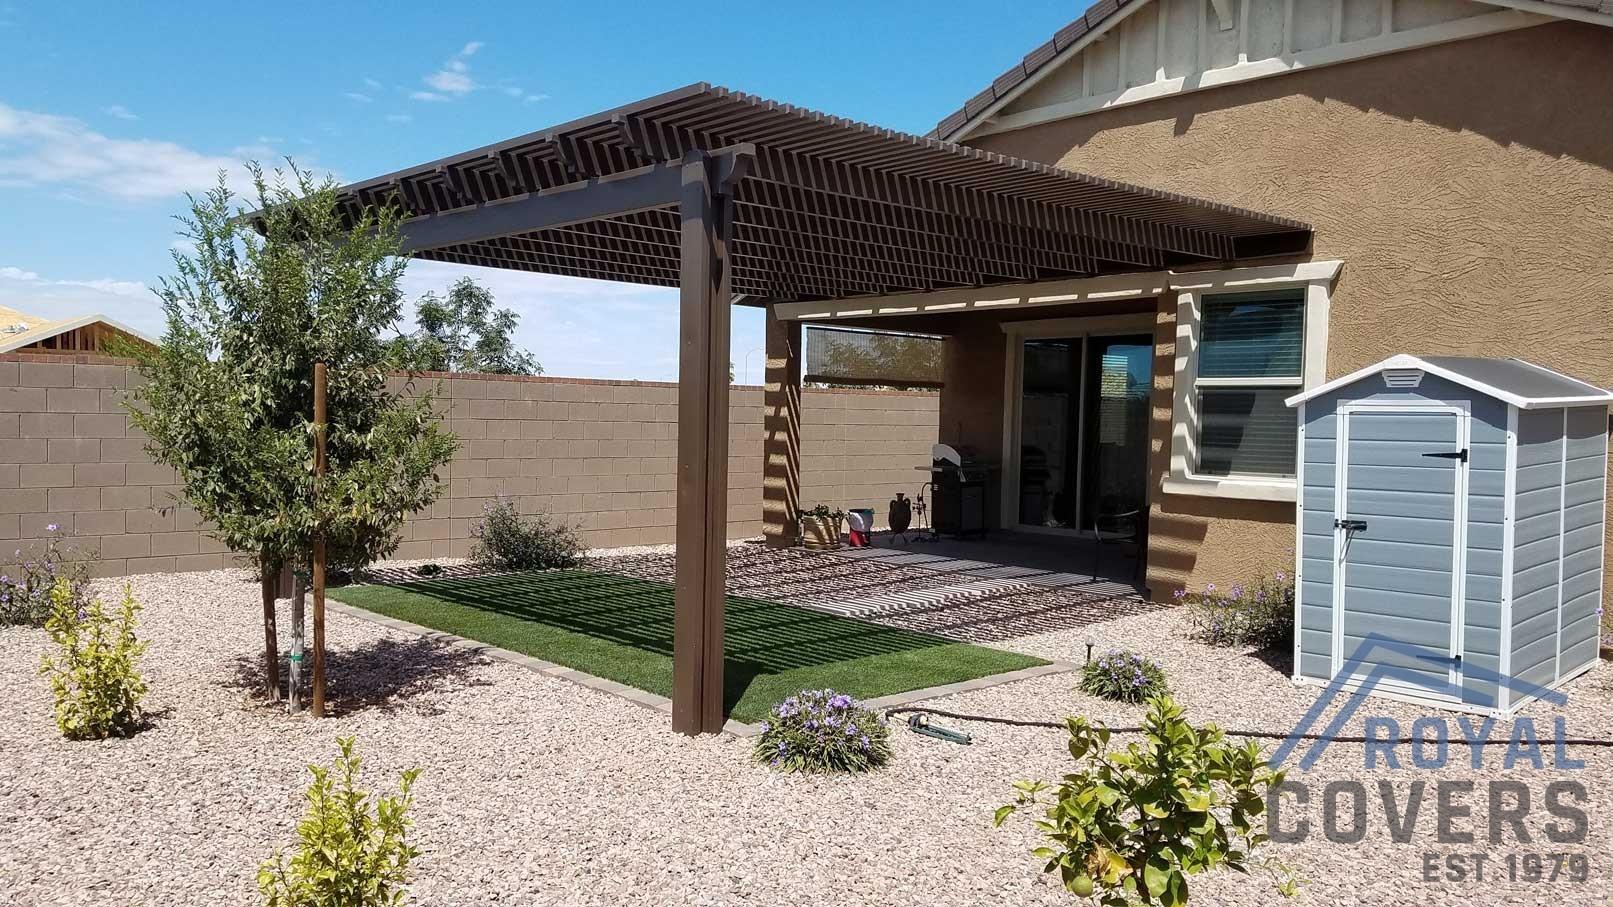 Backyard Patio Extension - Mesa AZ 85205 - Royal Covers on Backyard Patio Extension Ideas id=17909